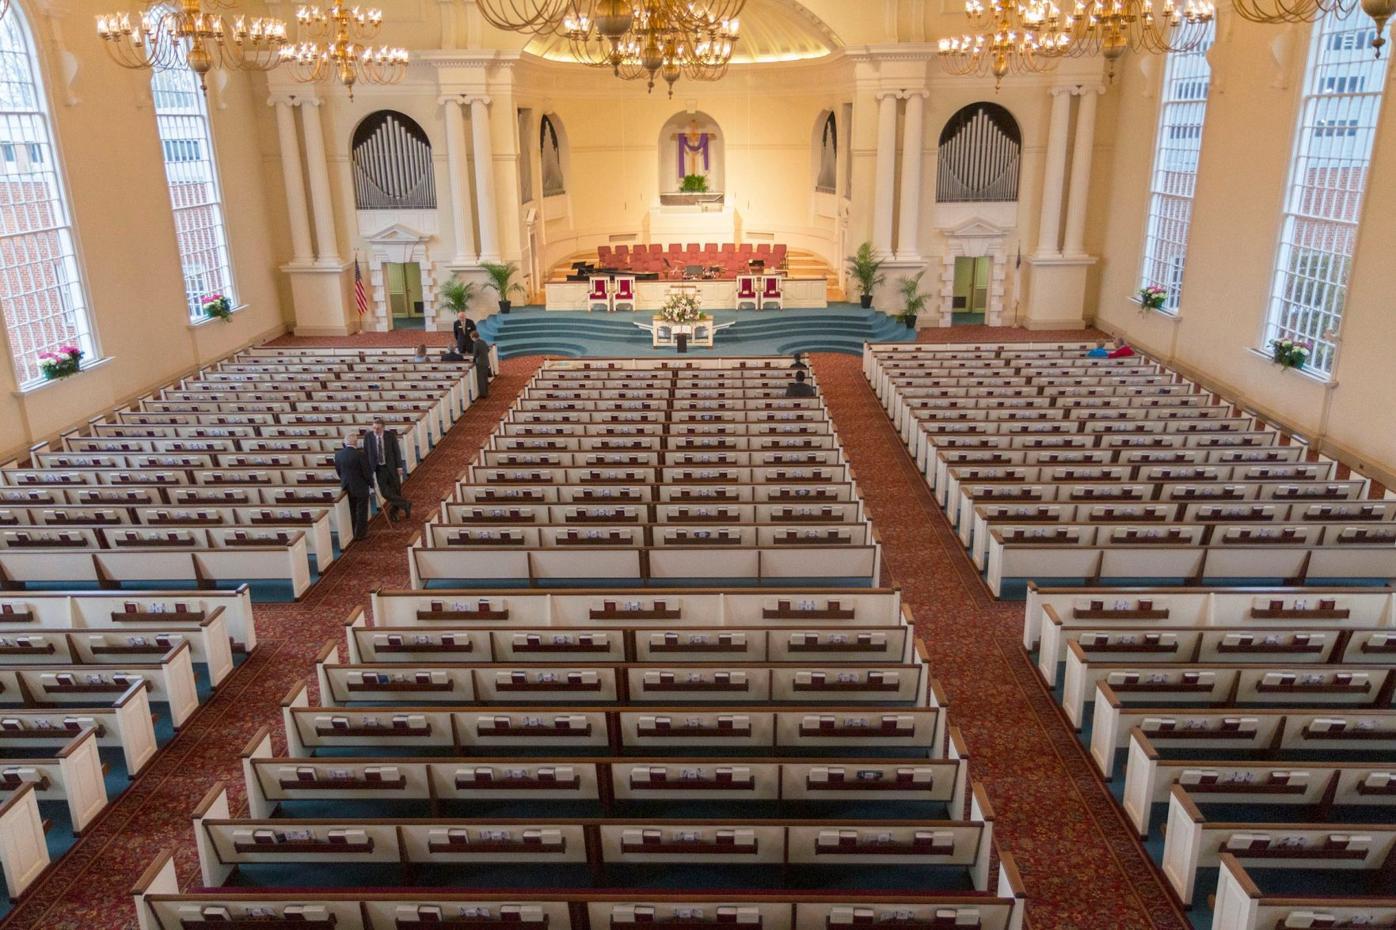 040120_MNS_Howard_Wieuca_001 Wieuca Road Baptist Church sanctuary